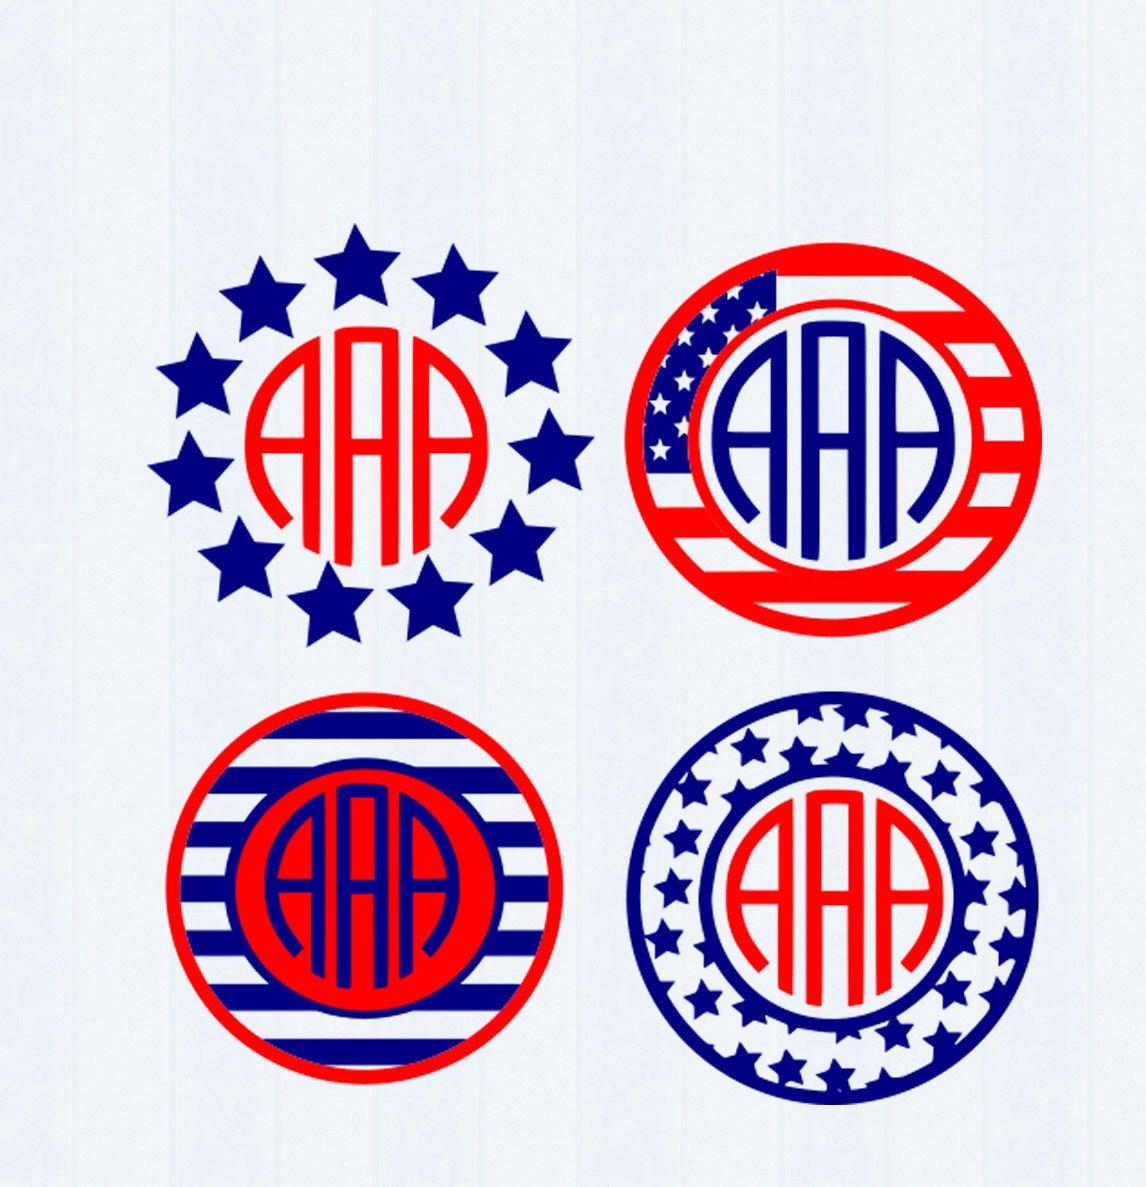 Patriotic July 4th svg American flag svg, USA monogram